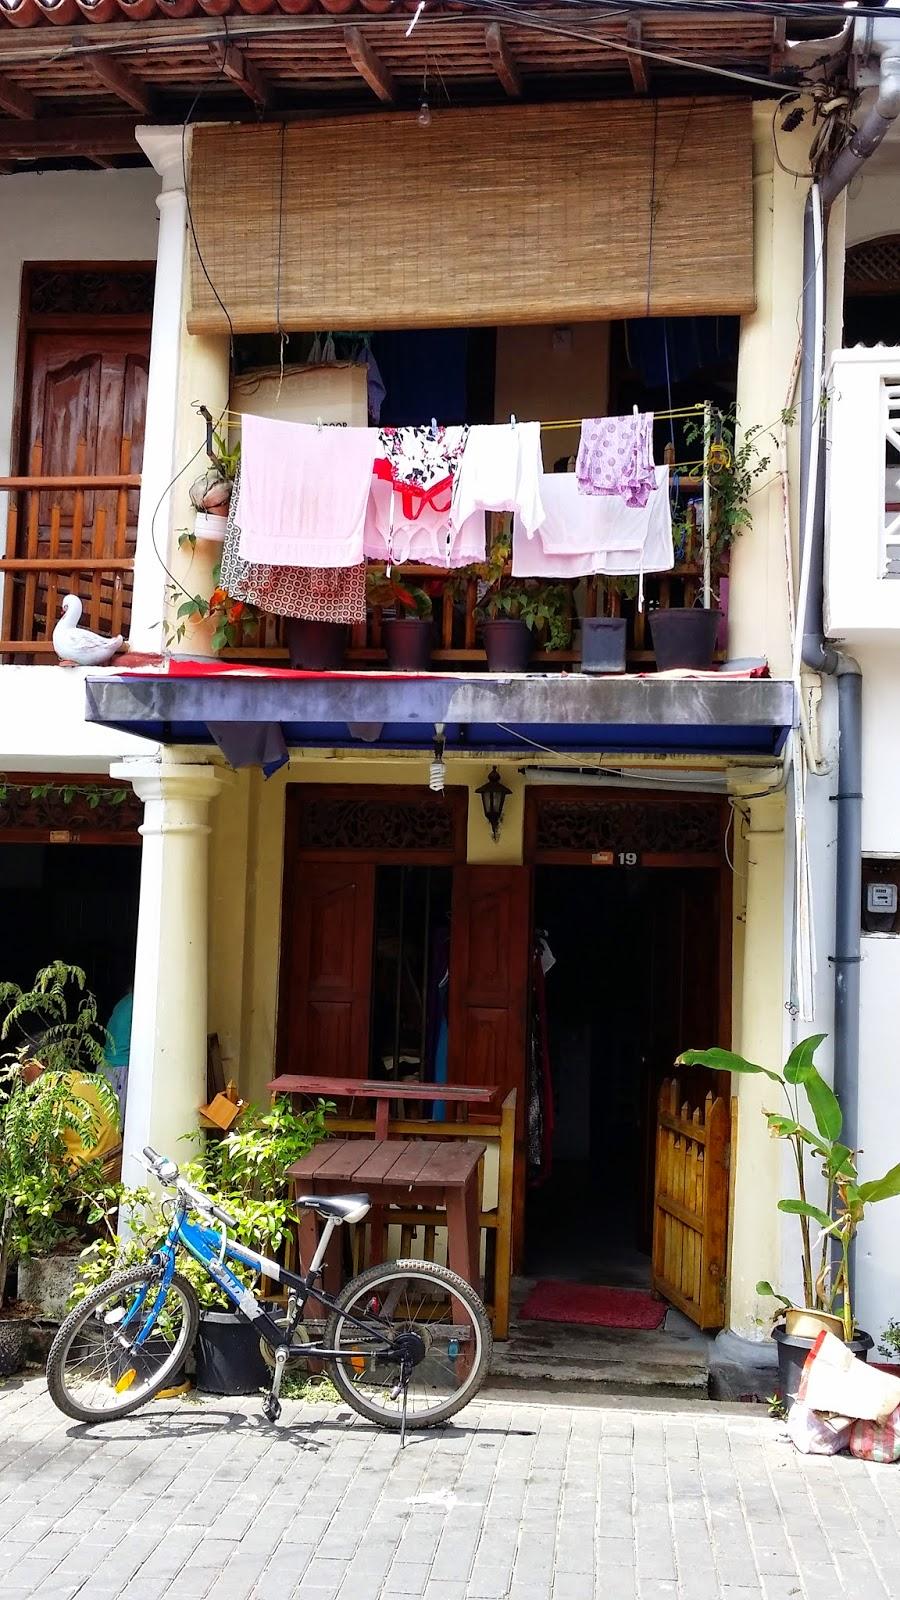 Colorido de las casas de Galle (Sri Lanka)